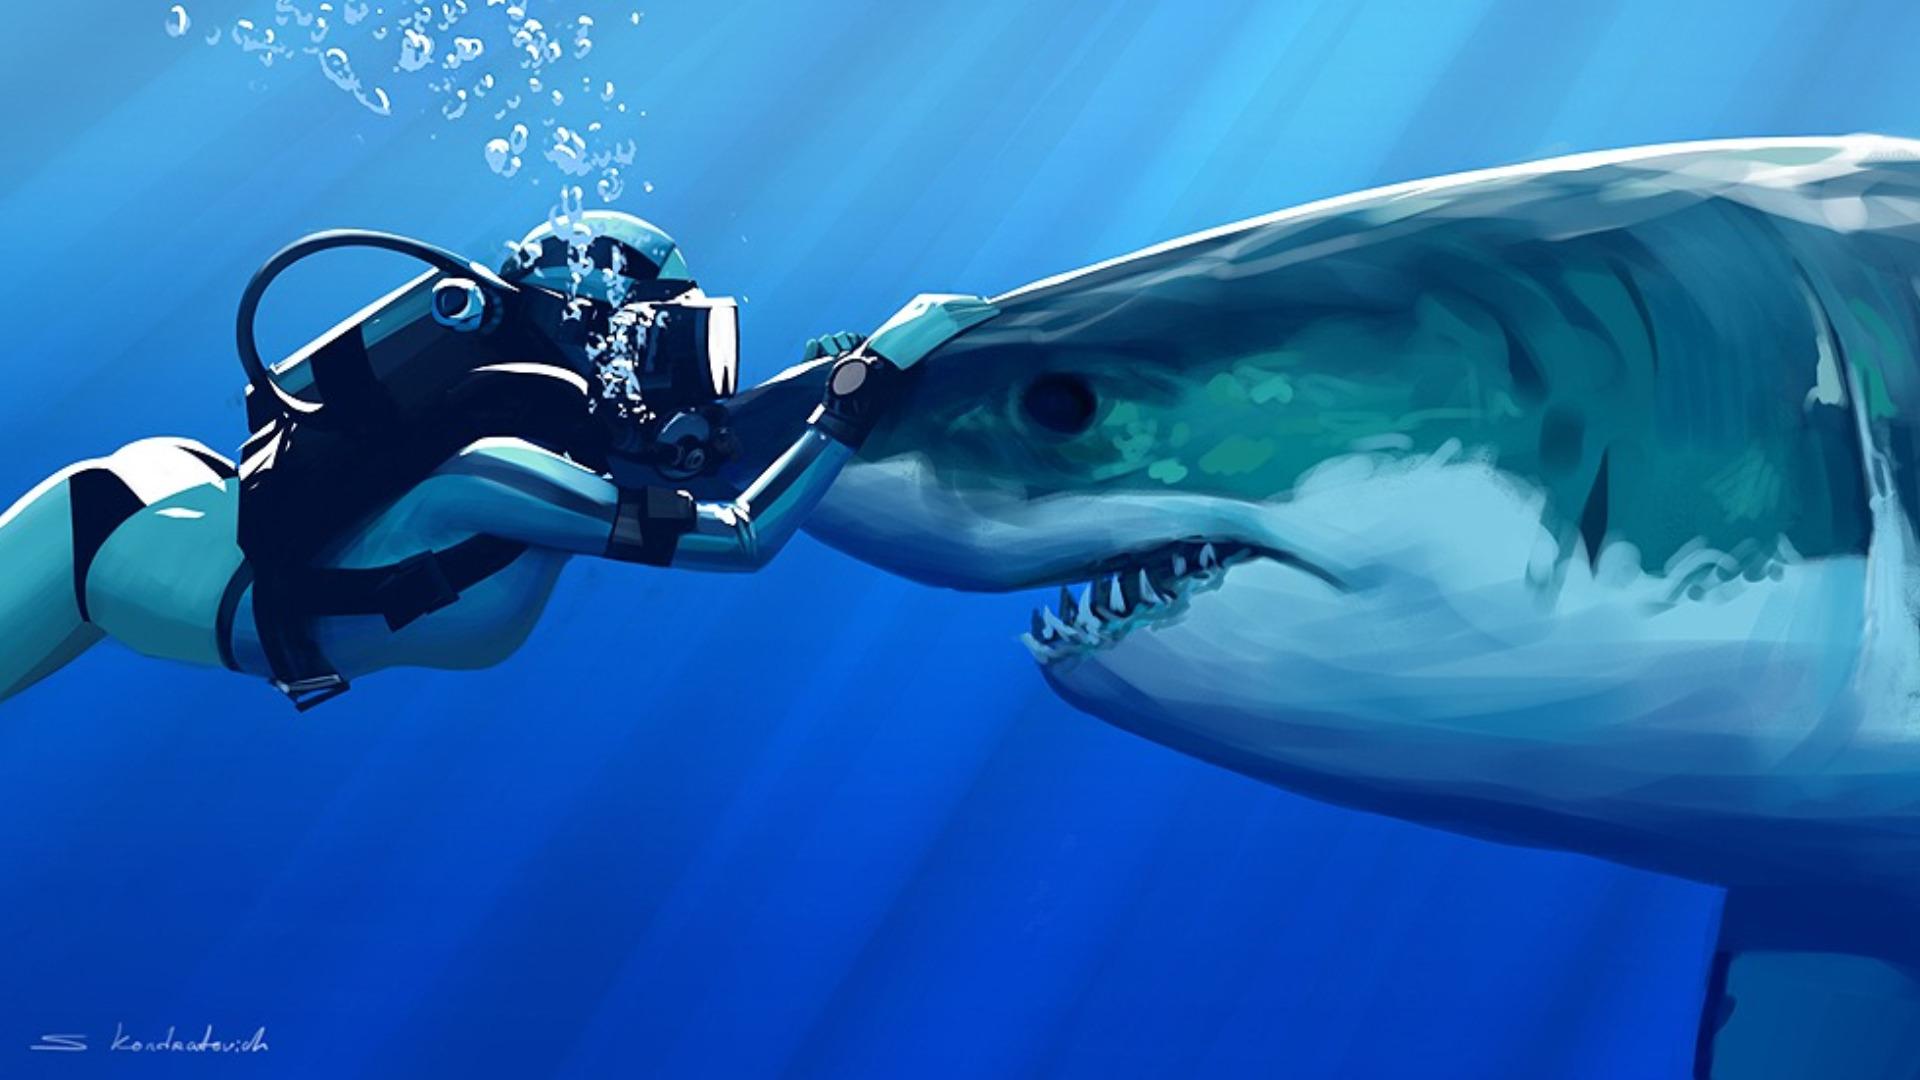 scuba diving wallpaper wallpapers - photo #40